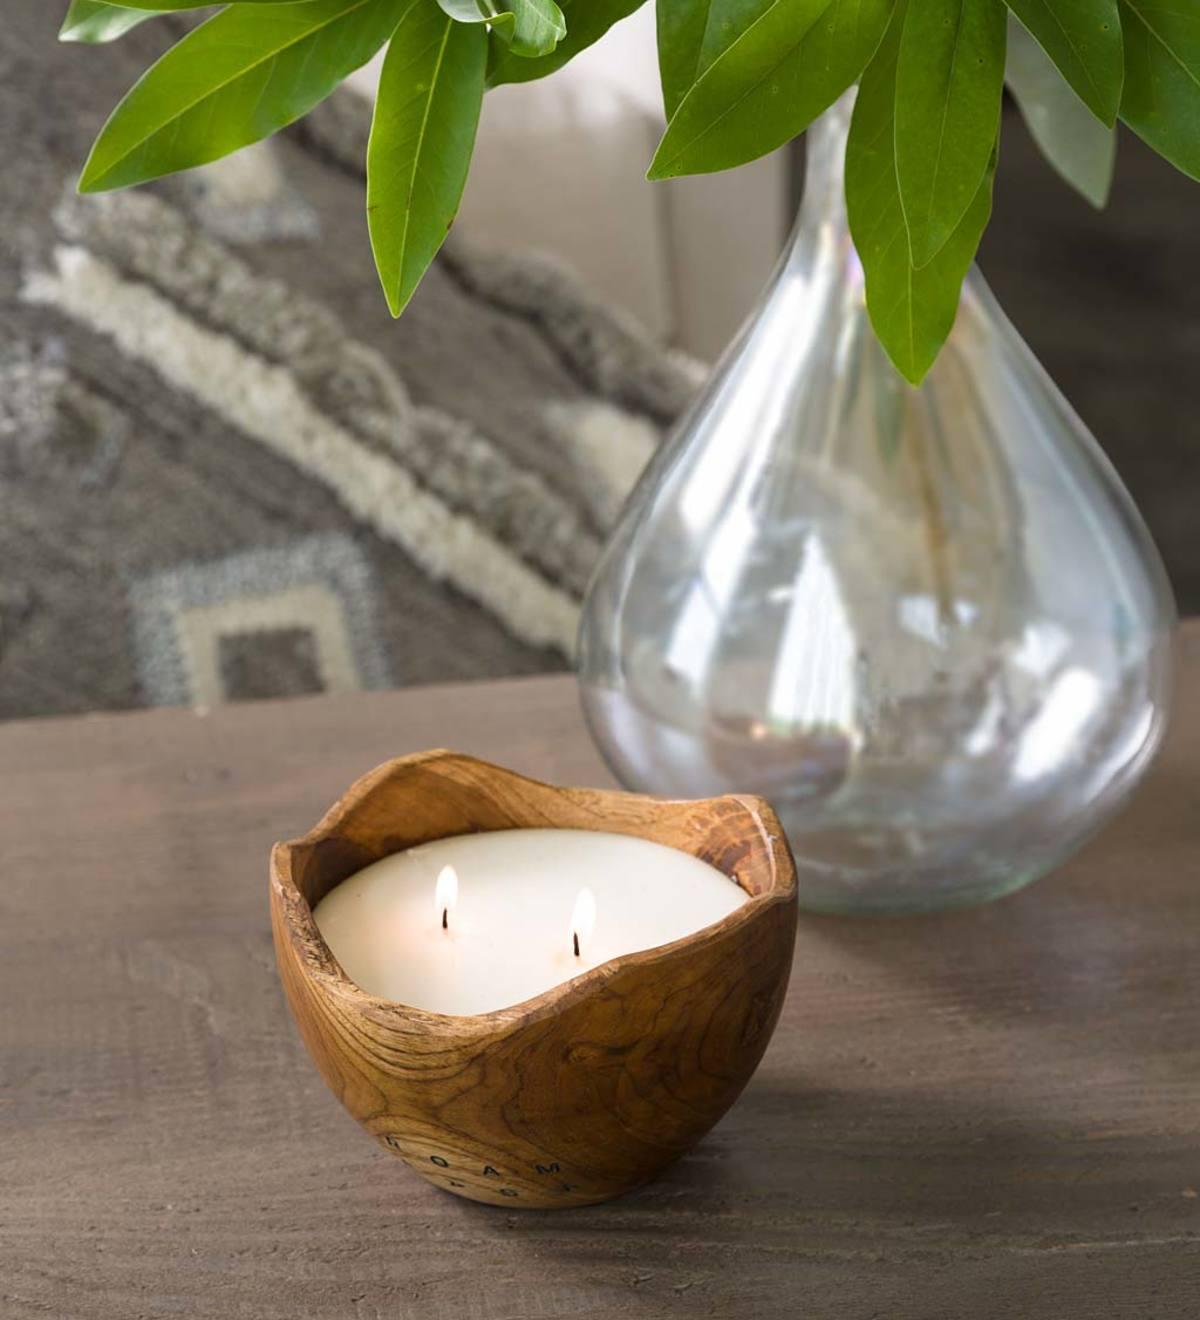 Candle Decorating Ideas Wood Bowl